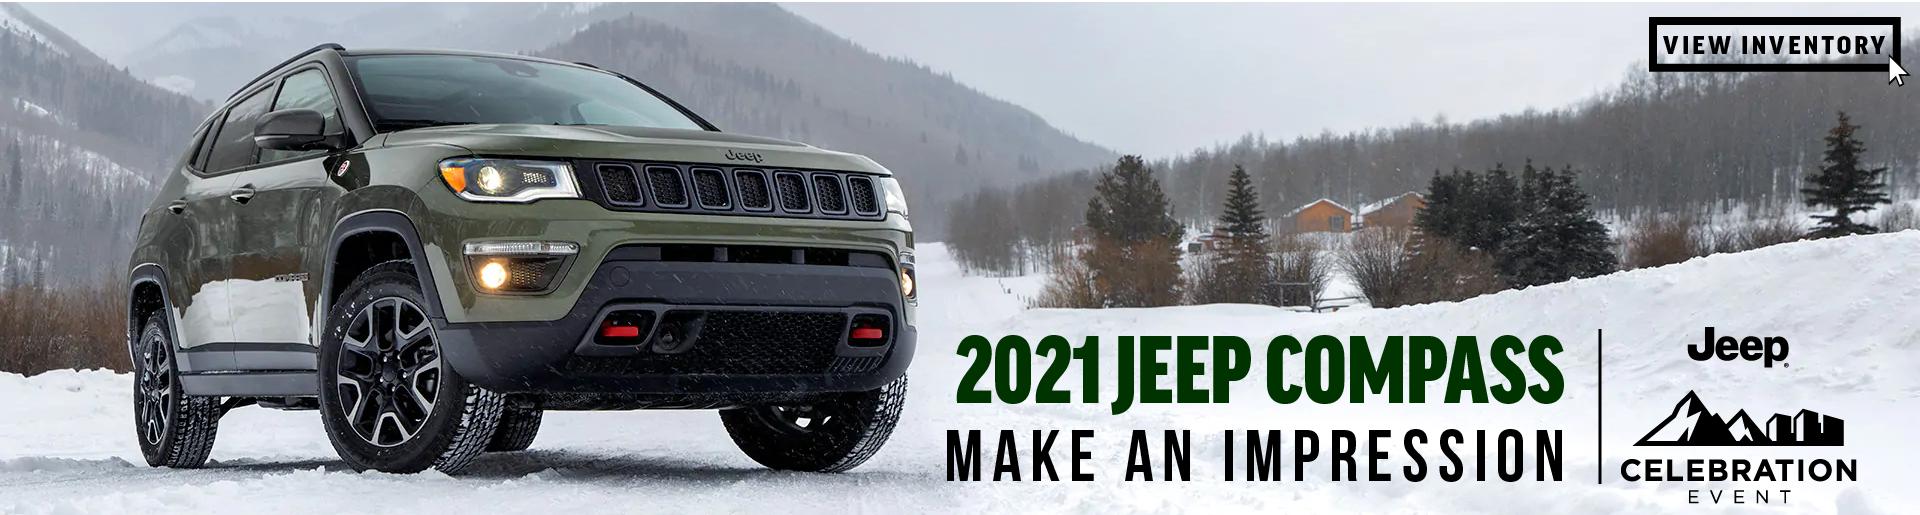 Mar 2021 Jeep Compass Generic